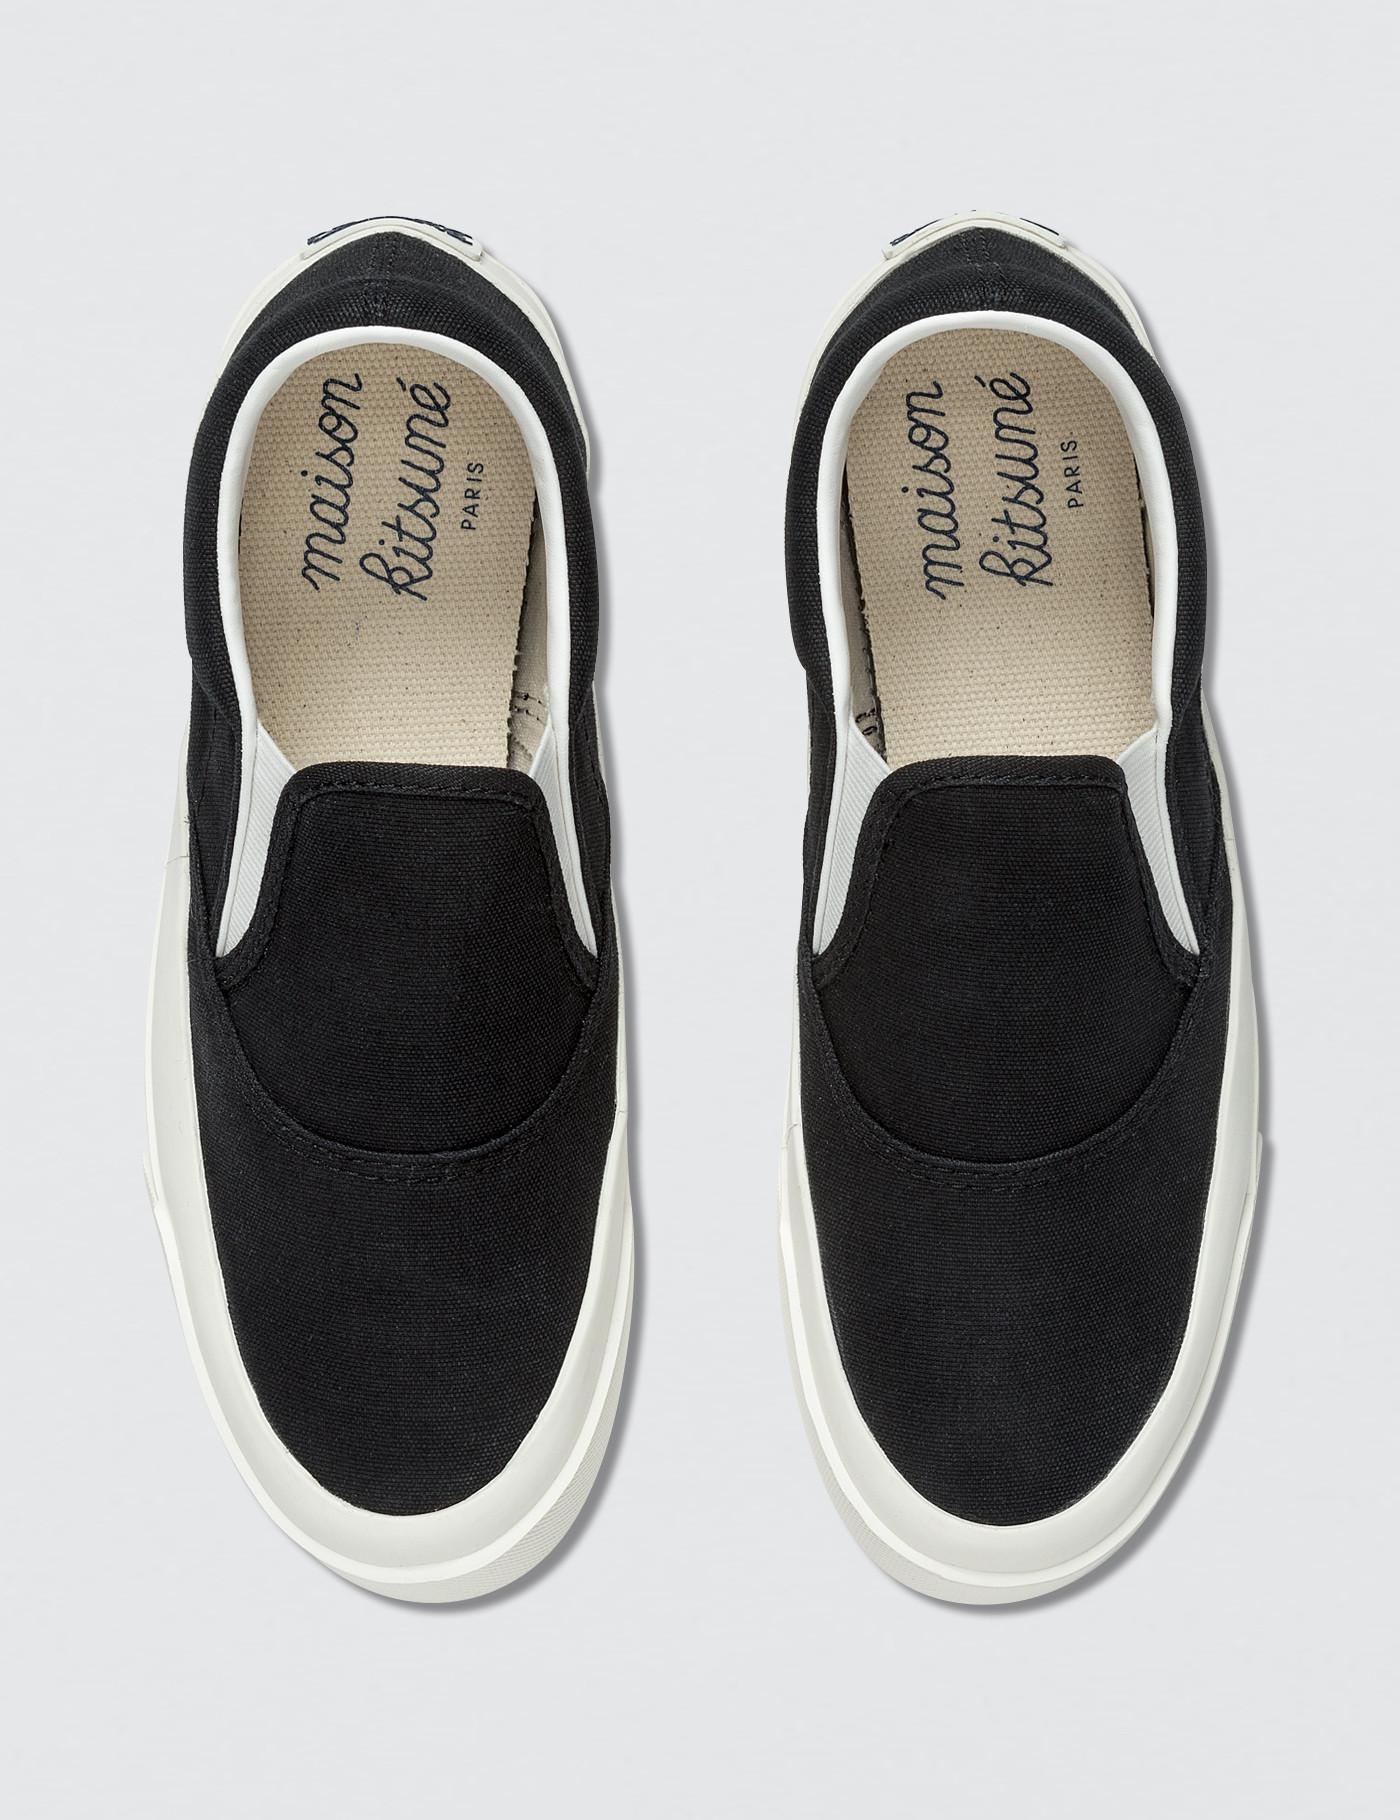 factory price b7eed 66eb0 maison-kitsune-Black-Par-Rec-Slip-on-Sneaker.jpeg